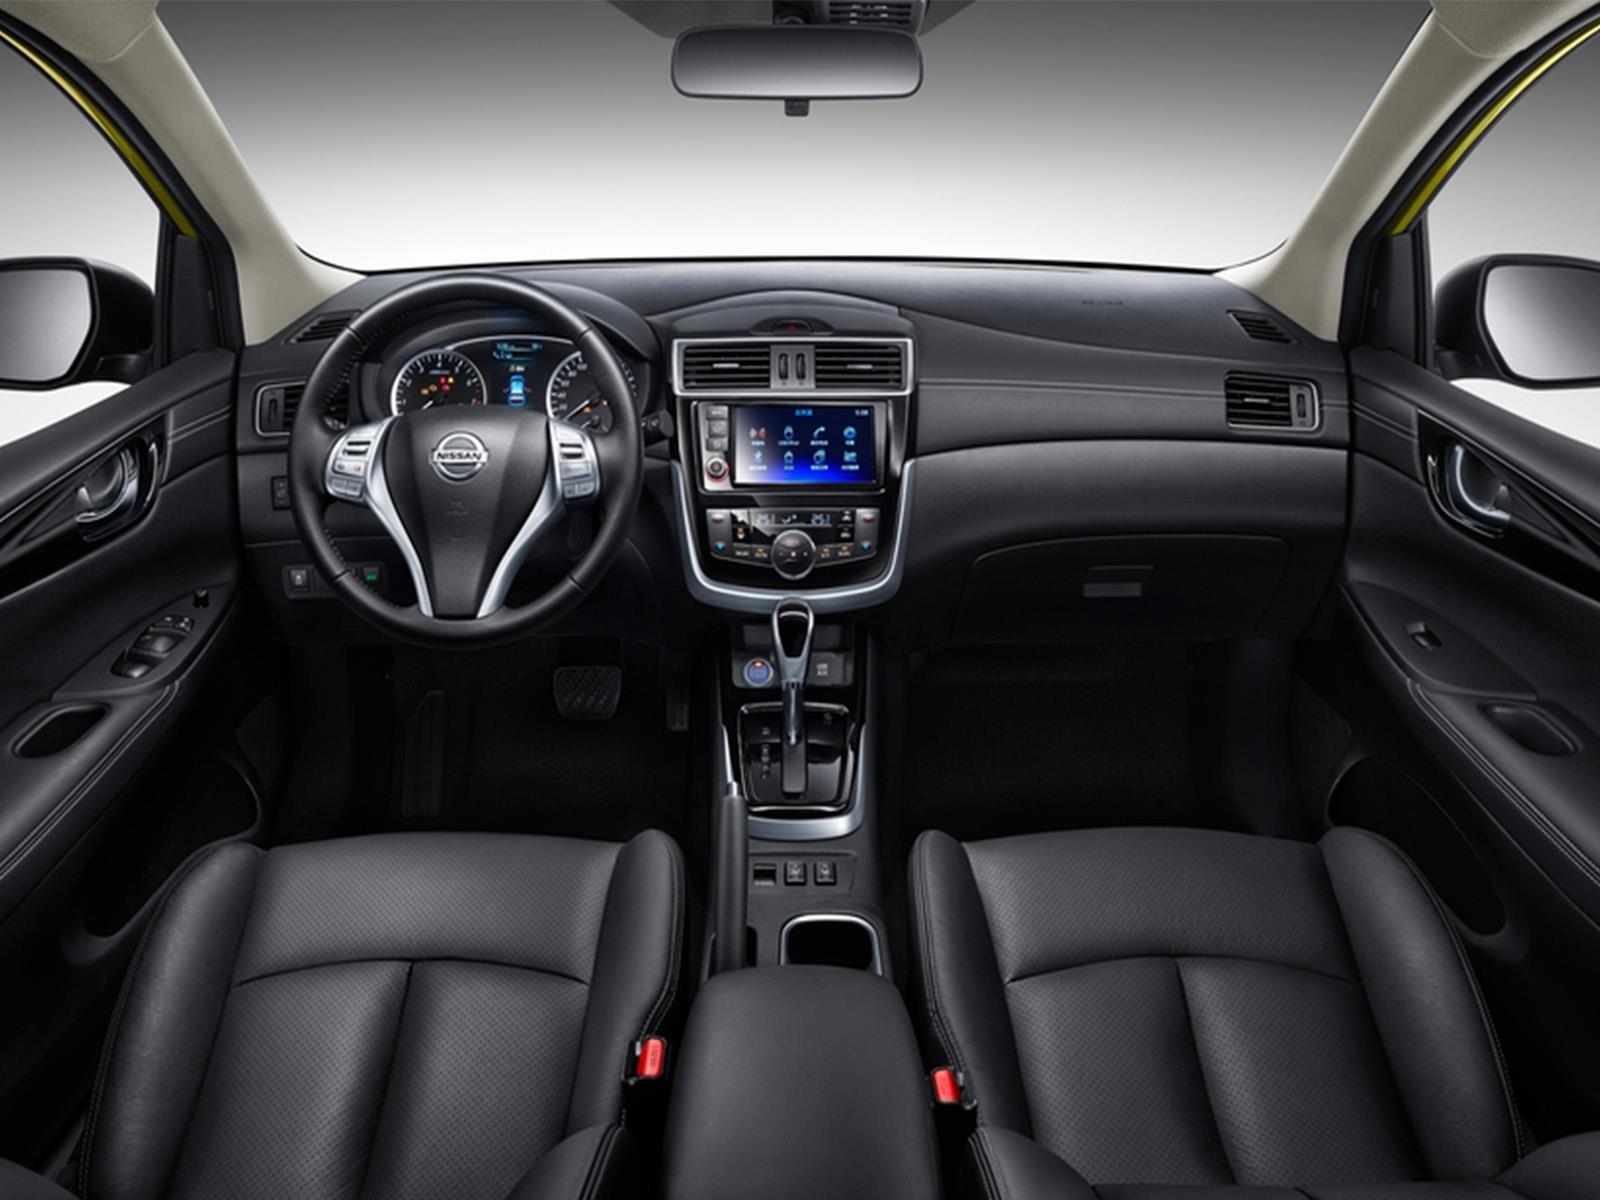 Nissan Tiida Hatchback se actualiza - Autocosmos.com